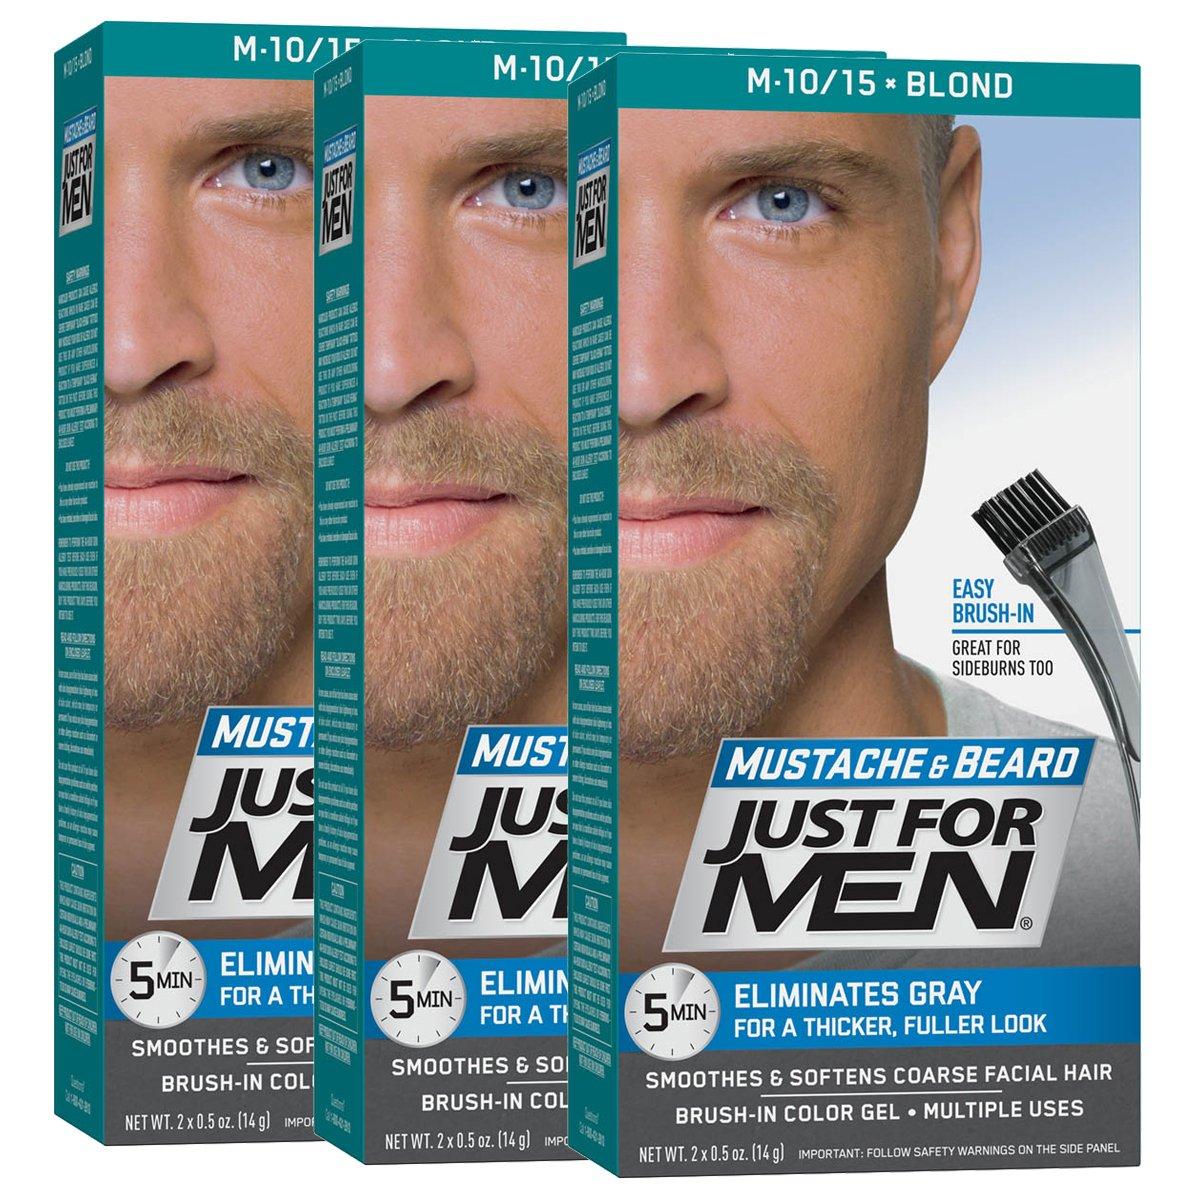 JUST FOR MEN Mustache & Beard Brush-In Color Gel, Blond M-10/15 1 Each (Pack of 3) 011509049001